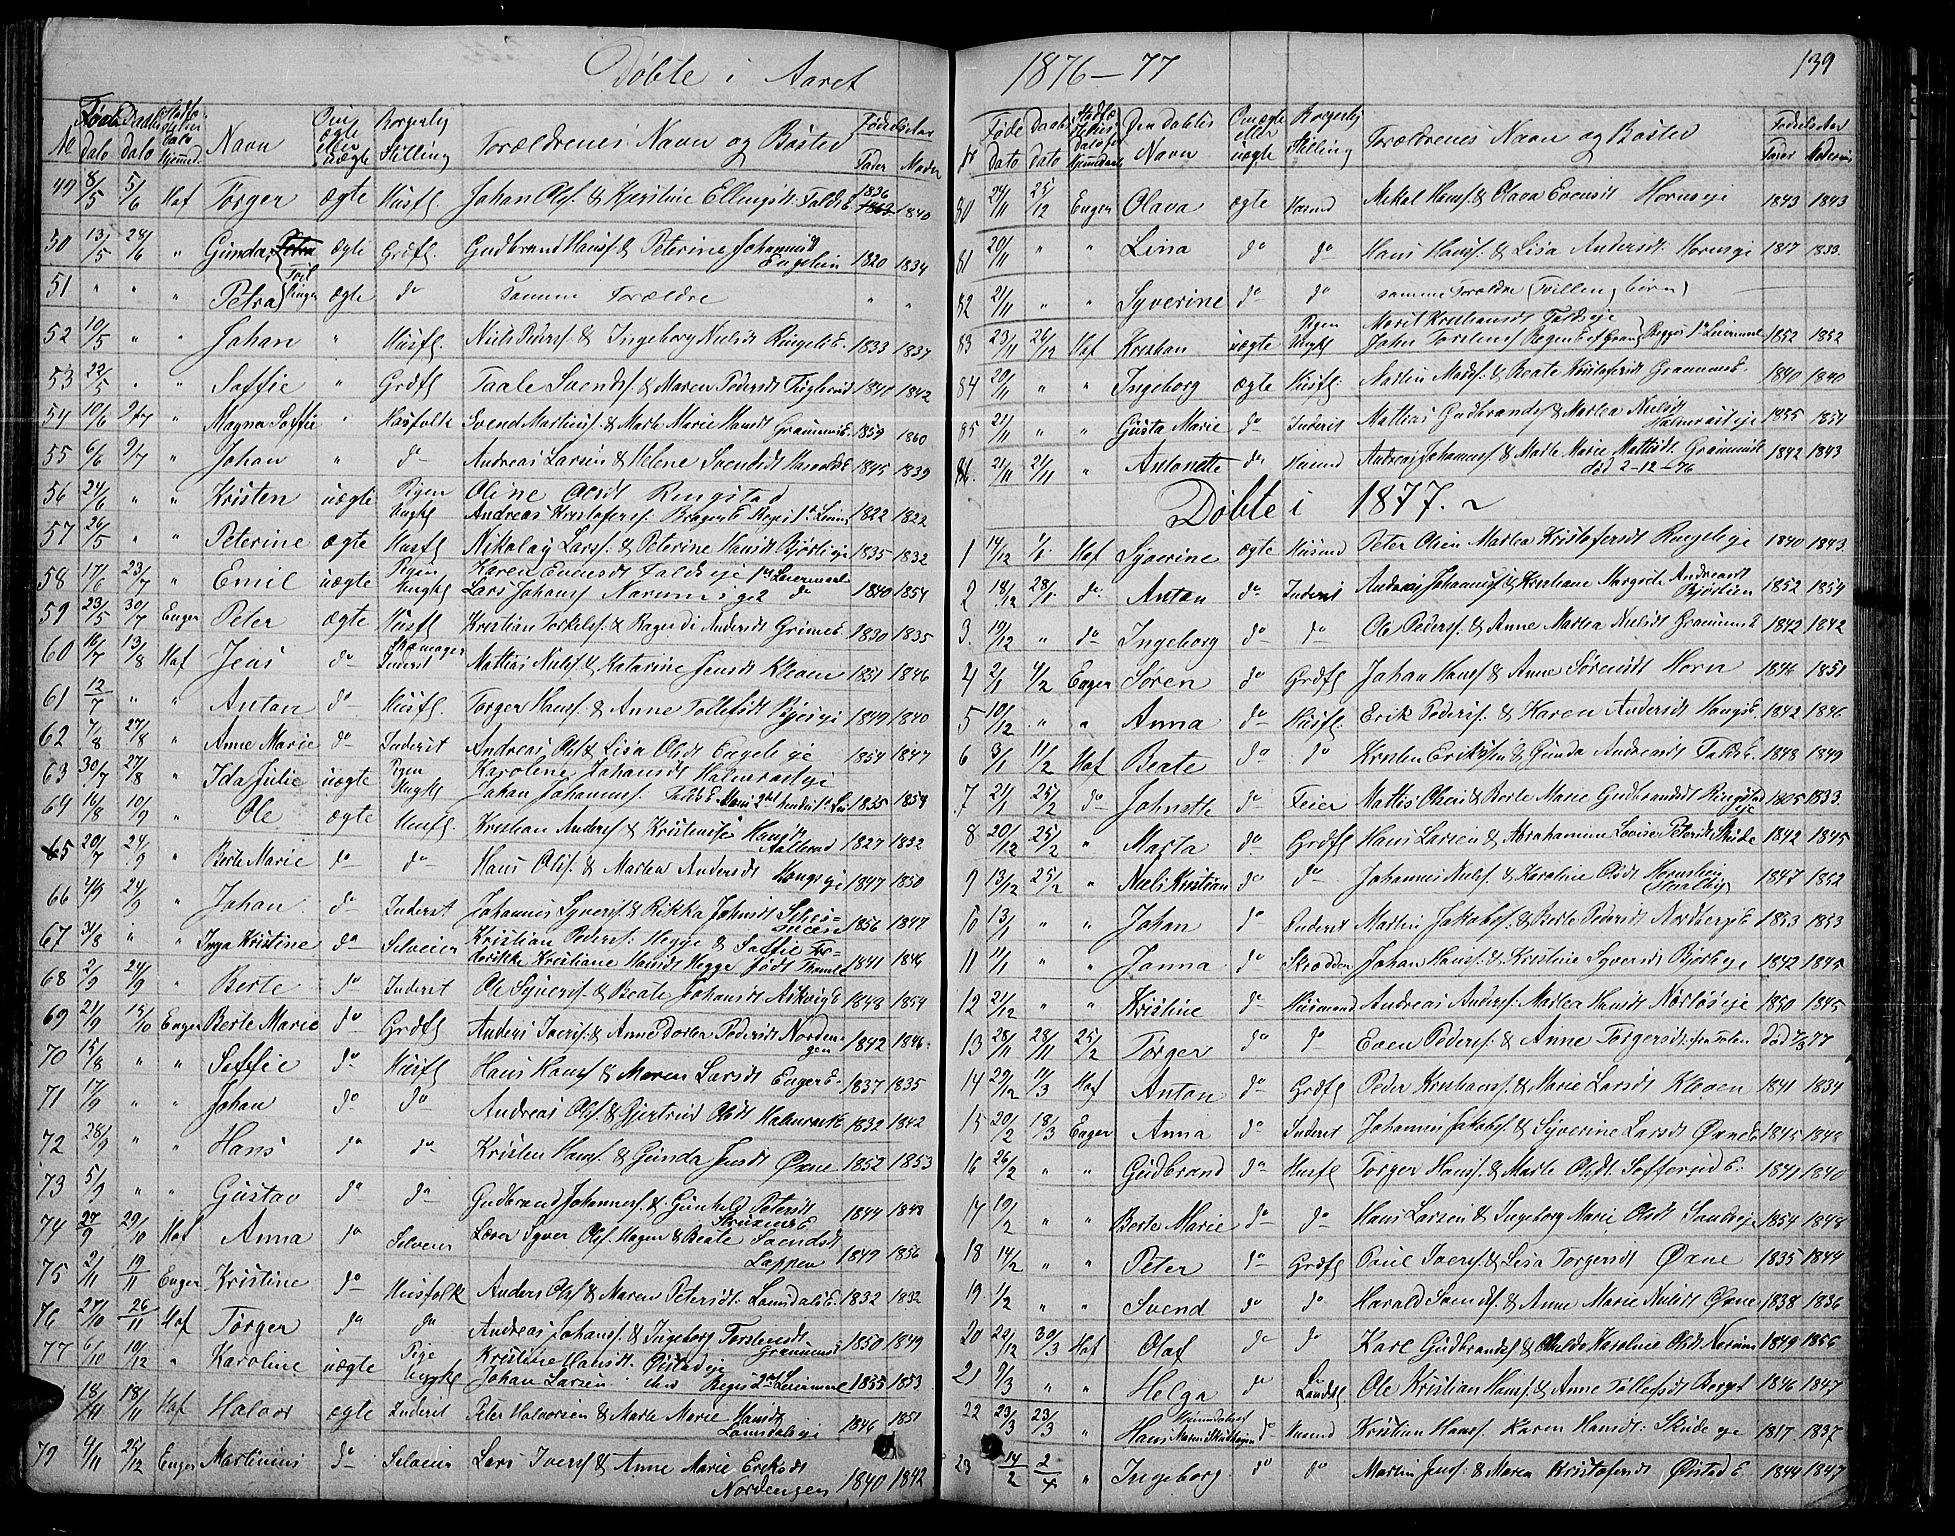 SAH, Søndre Land prestekontor, L/L0001: Klokkerbok nr. 1, 1849-1883, s. 139